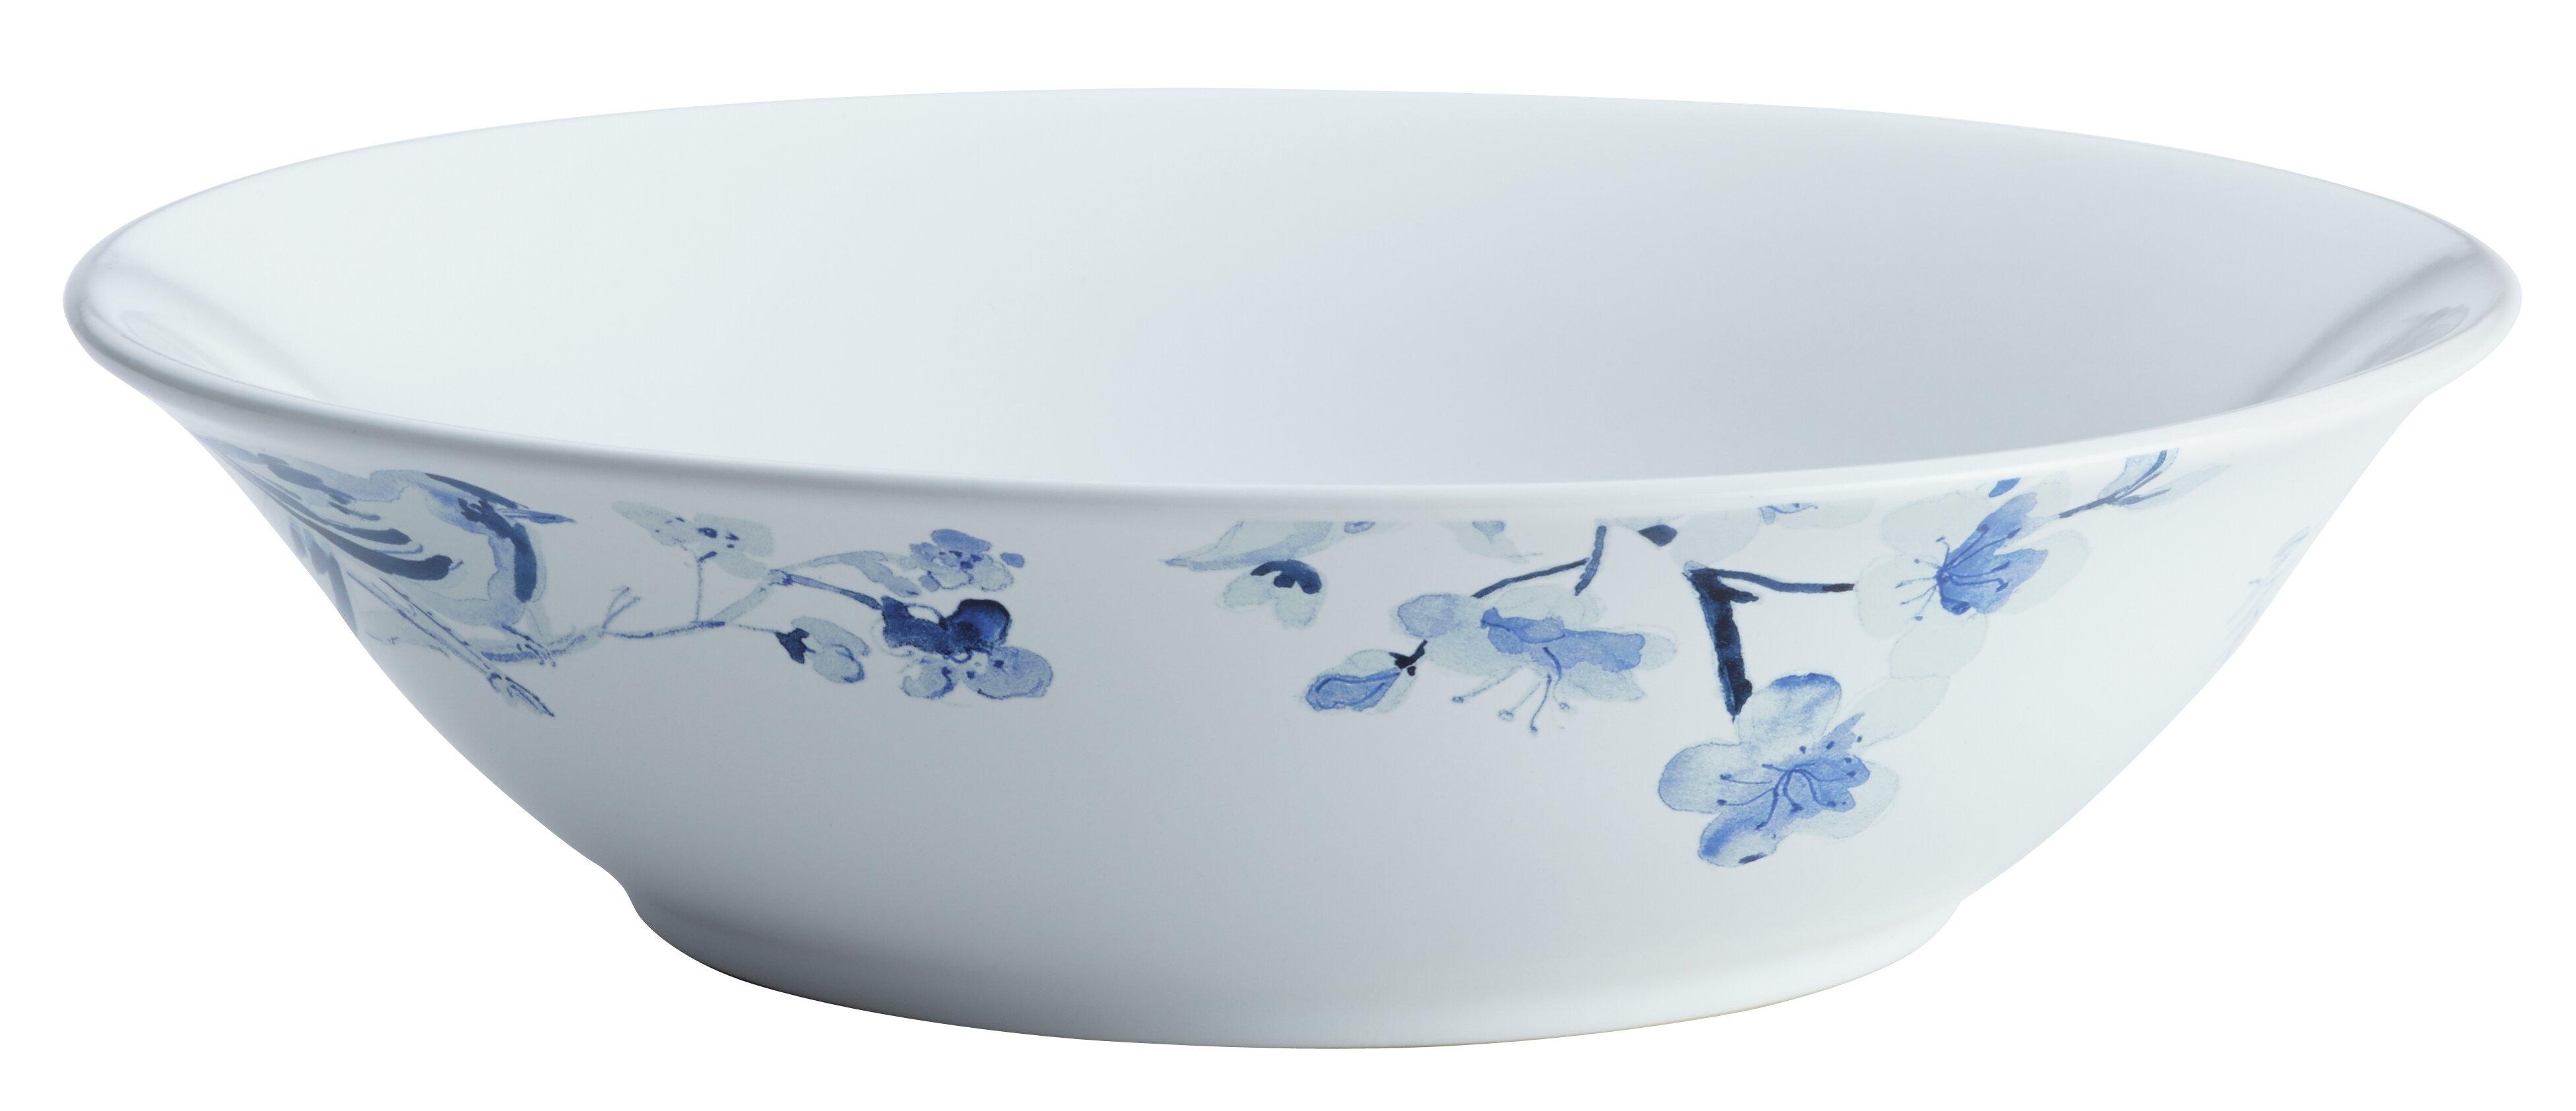 Paula Deen Indigo Blossom Stoneware Round Serving Bowl | Wayfair